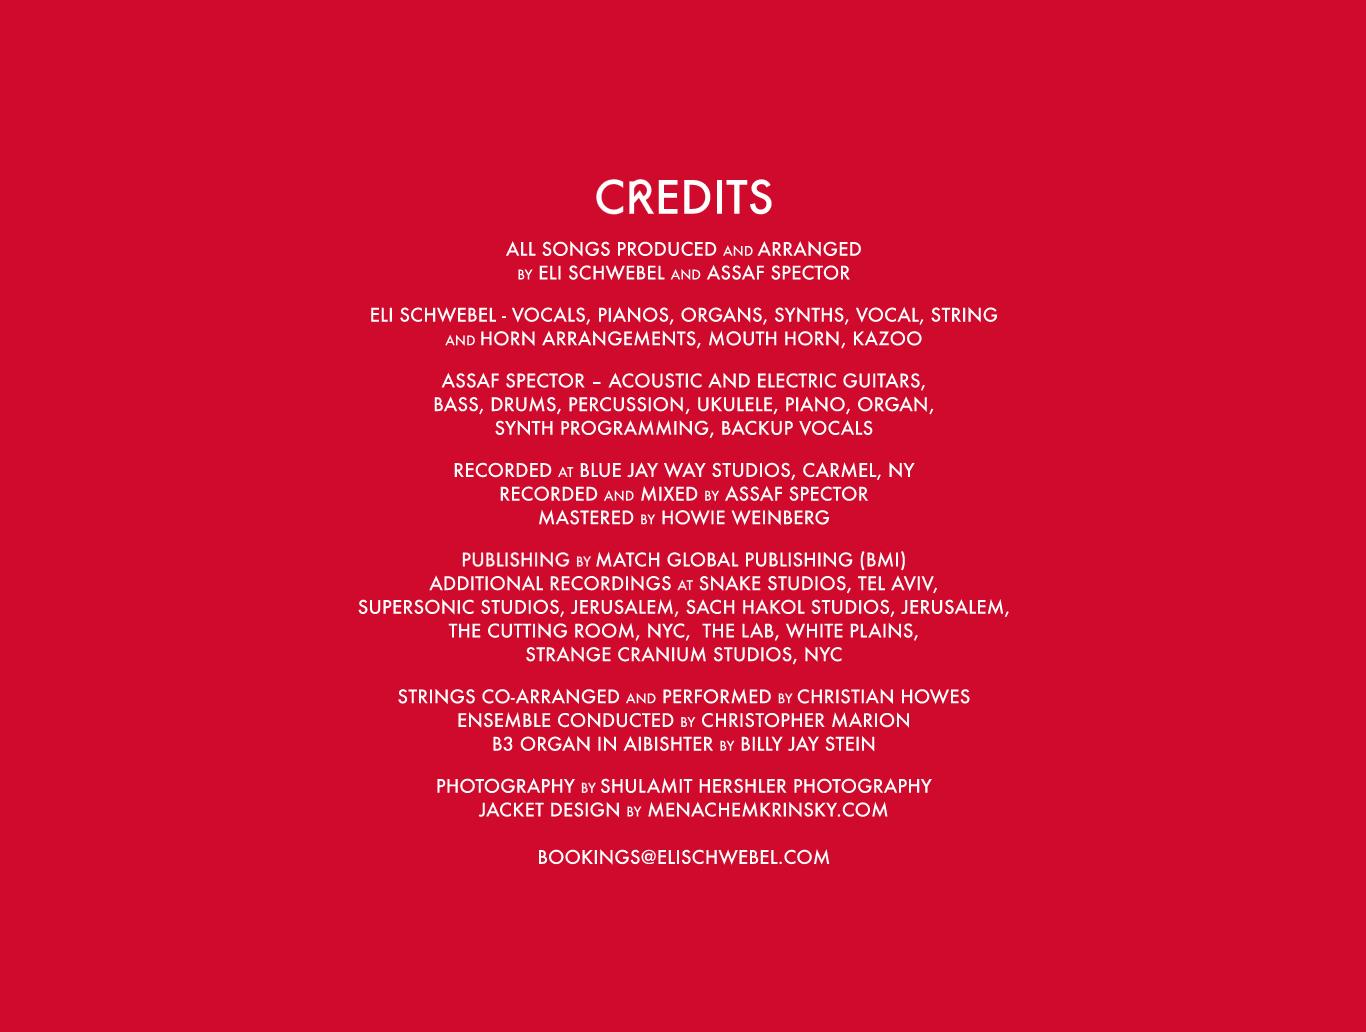 album_credits copy.jpg